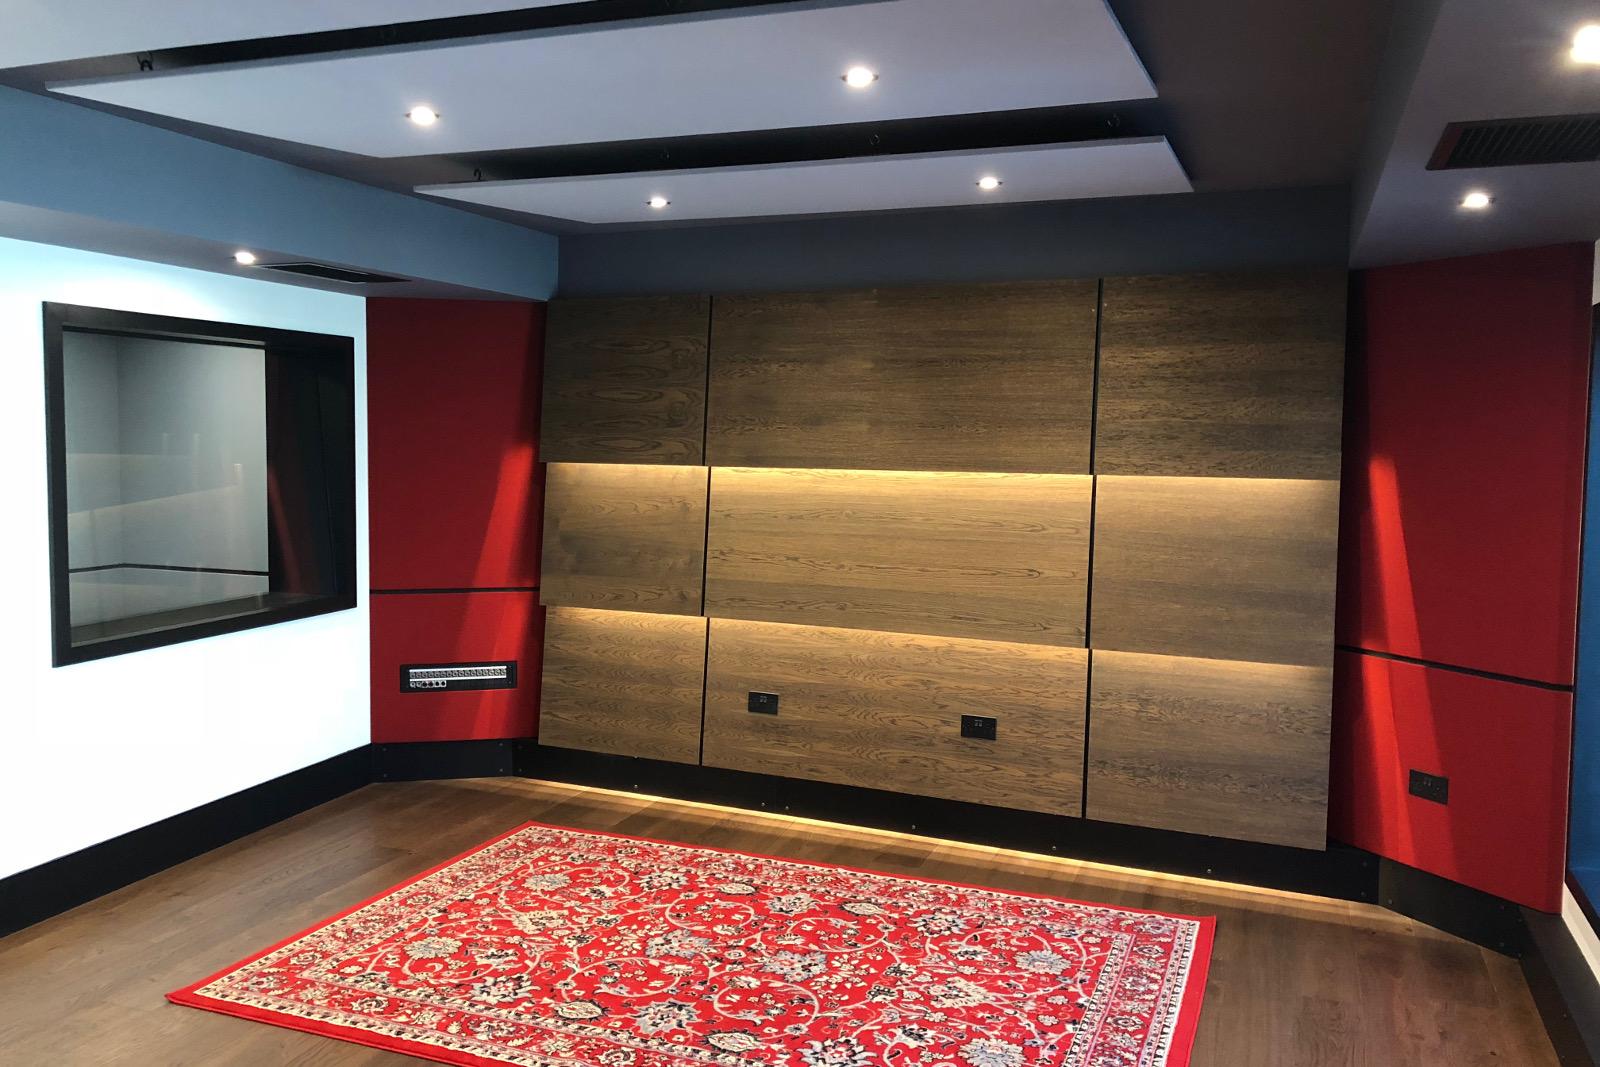 recording studio live room acoustic wall studio creations